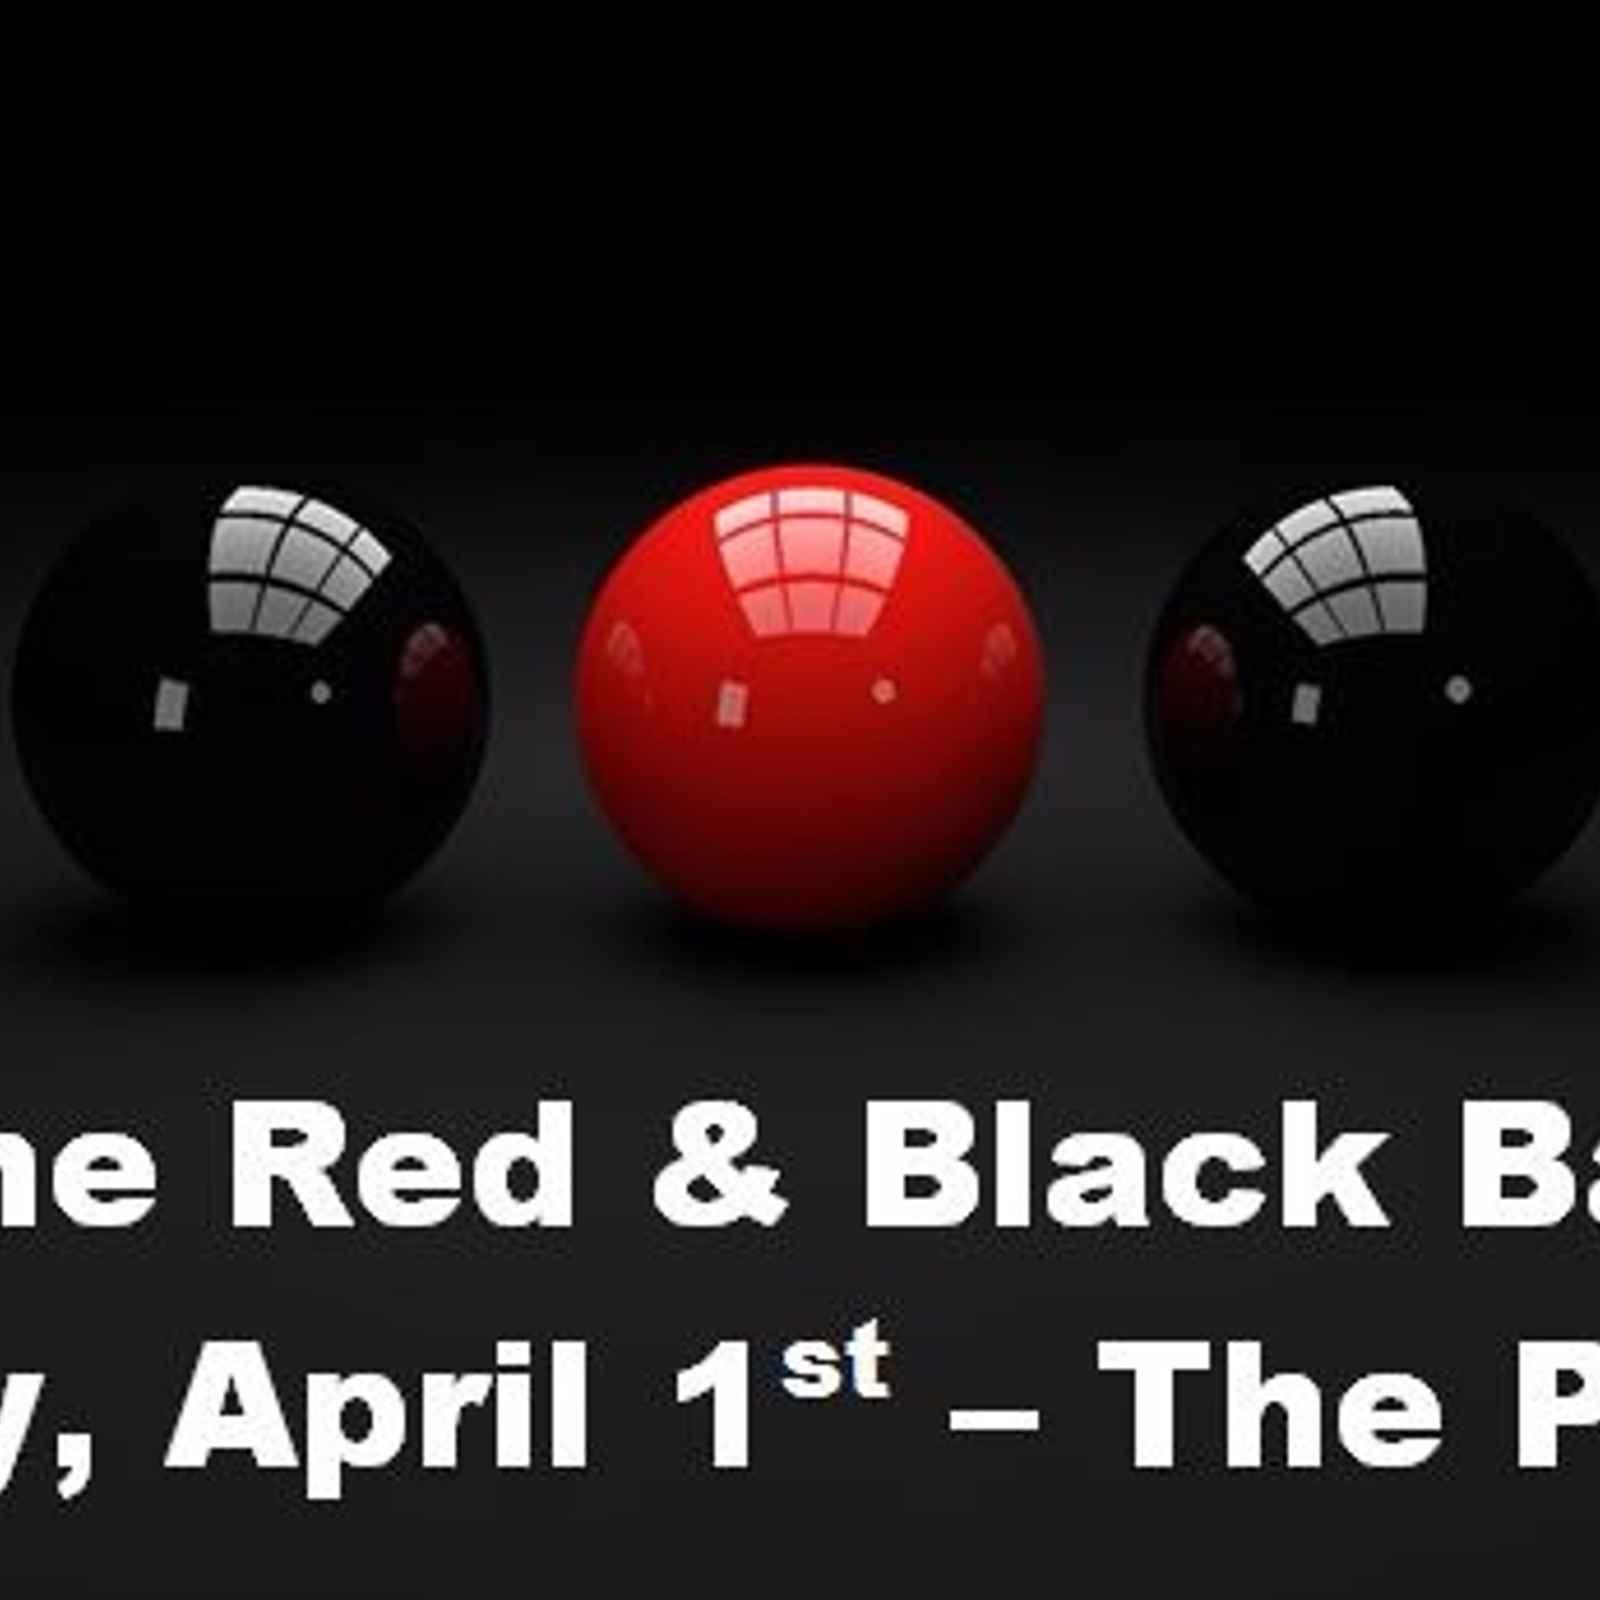 2016 Red & Black Ball - Friday, April 1st